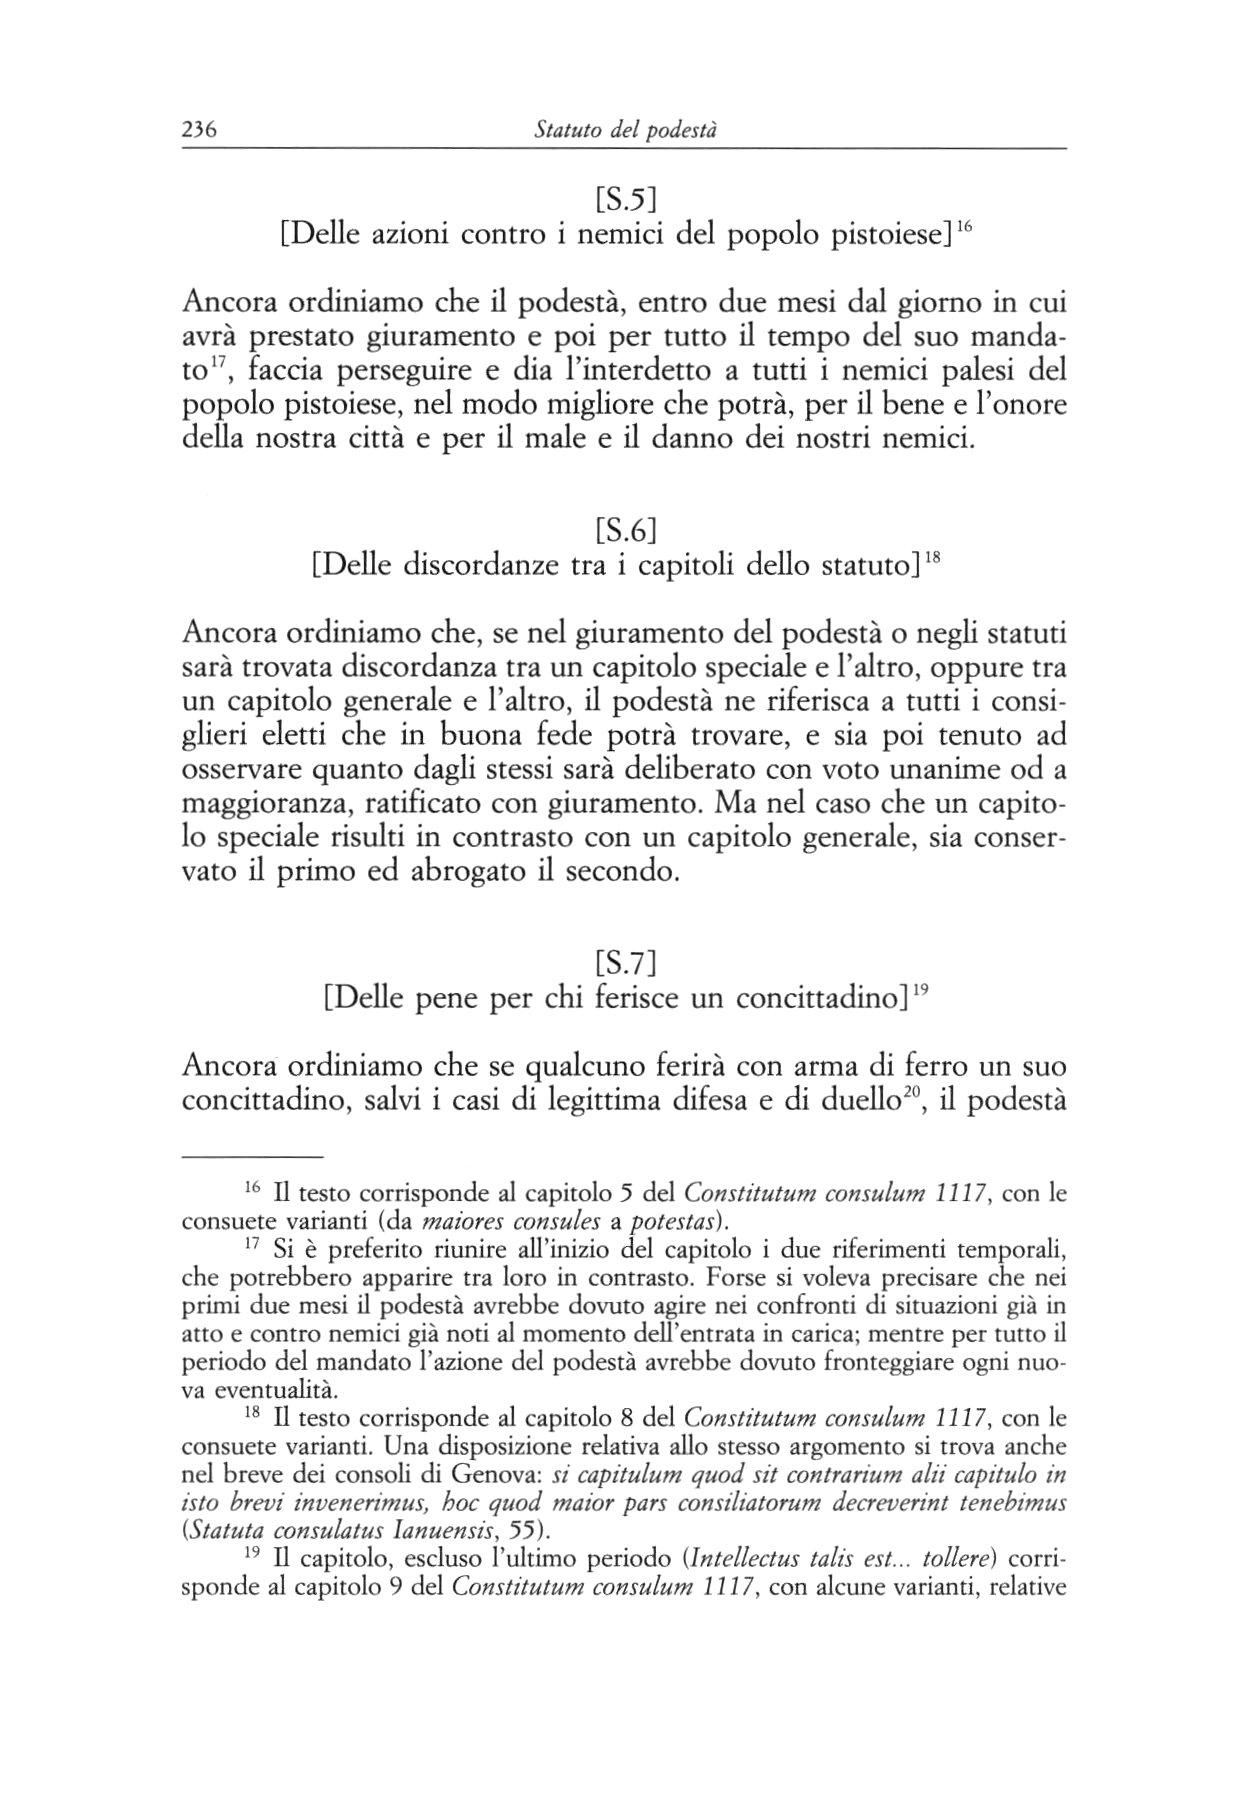 statuti pistoiesi del sec.XII 0236.jpg